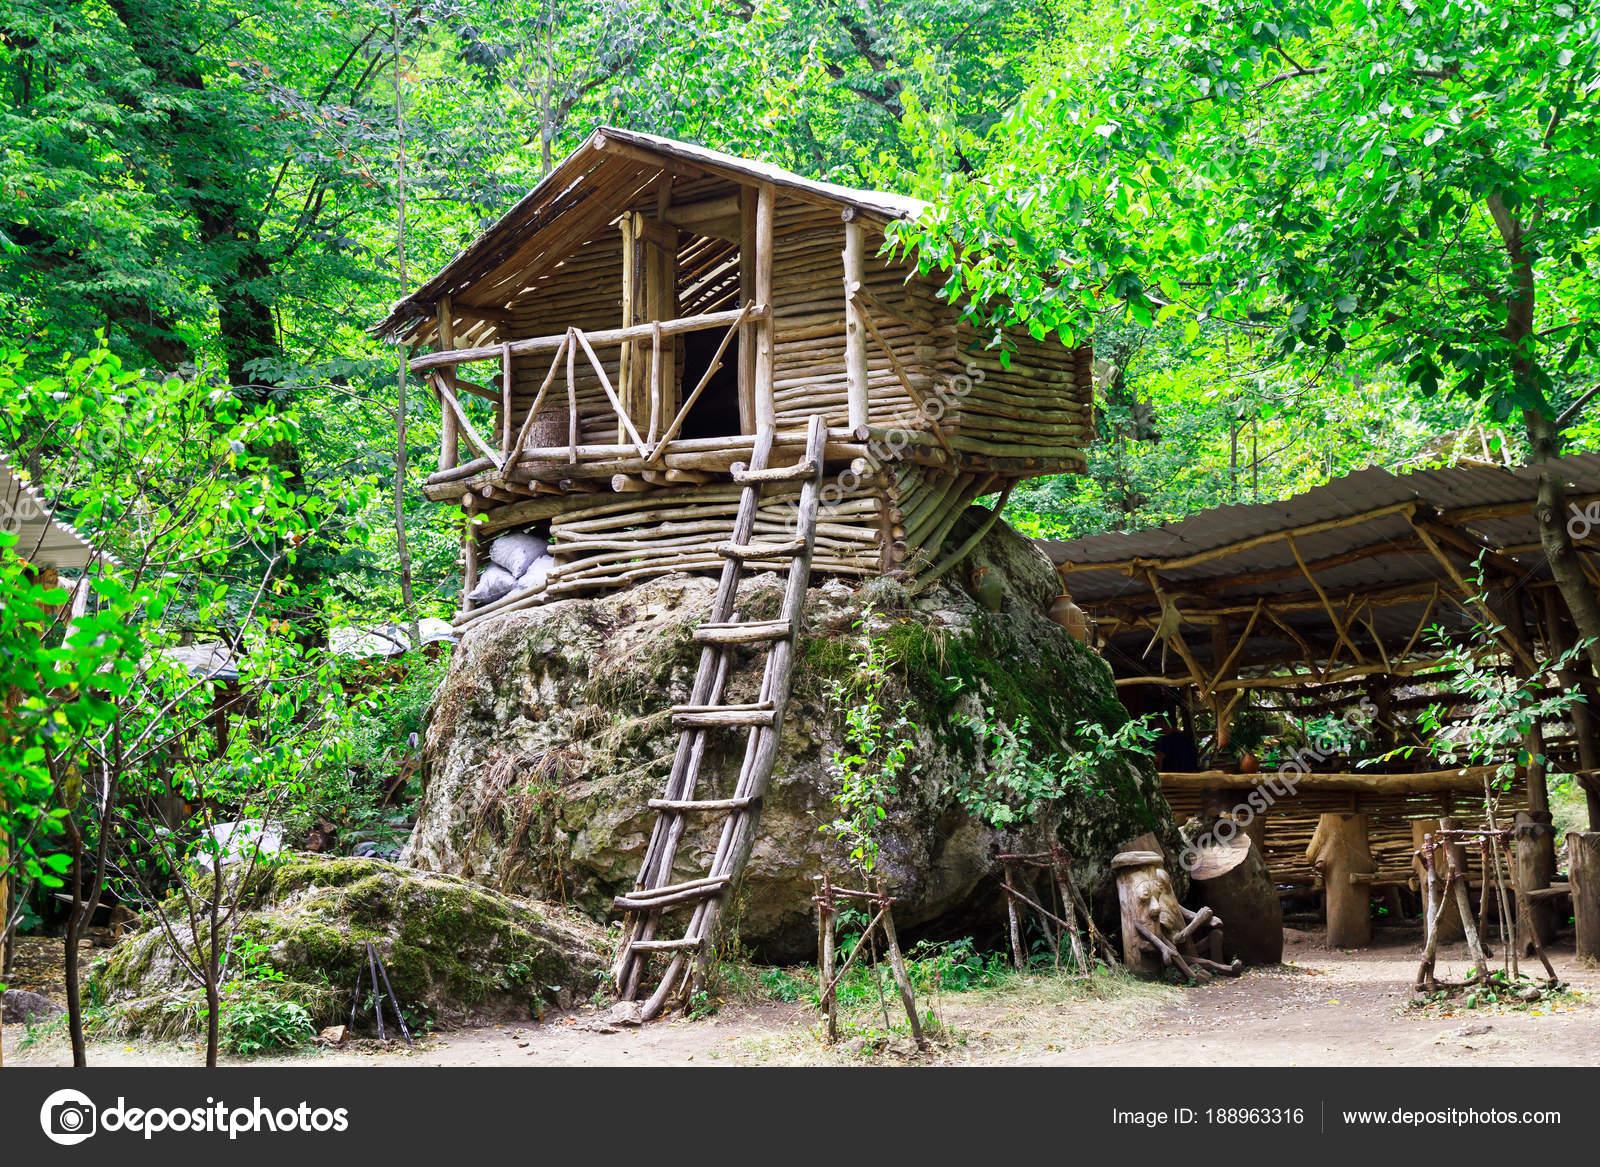 Houten huisje met toegang trap het bos u2014 stockfoto © danielt.1994